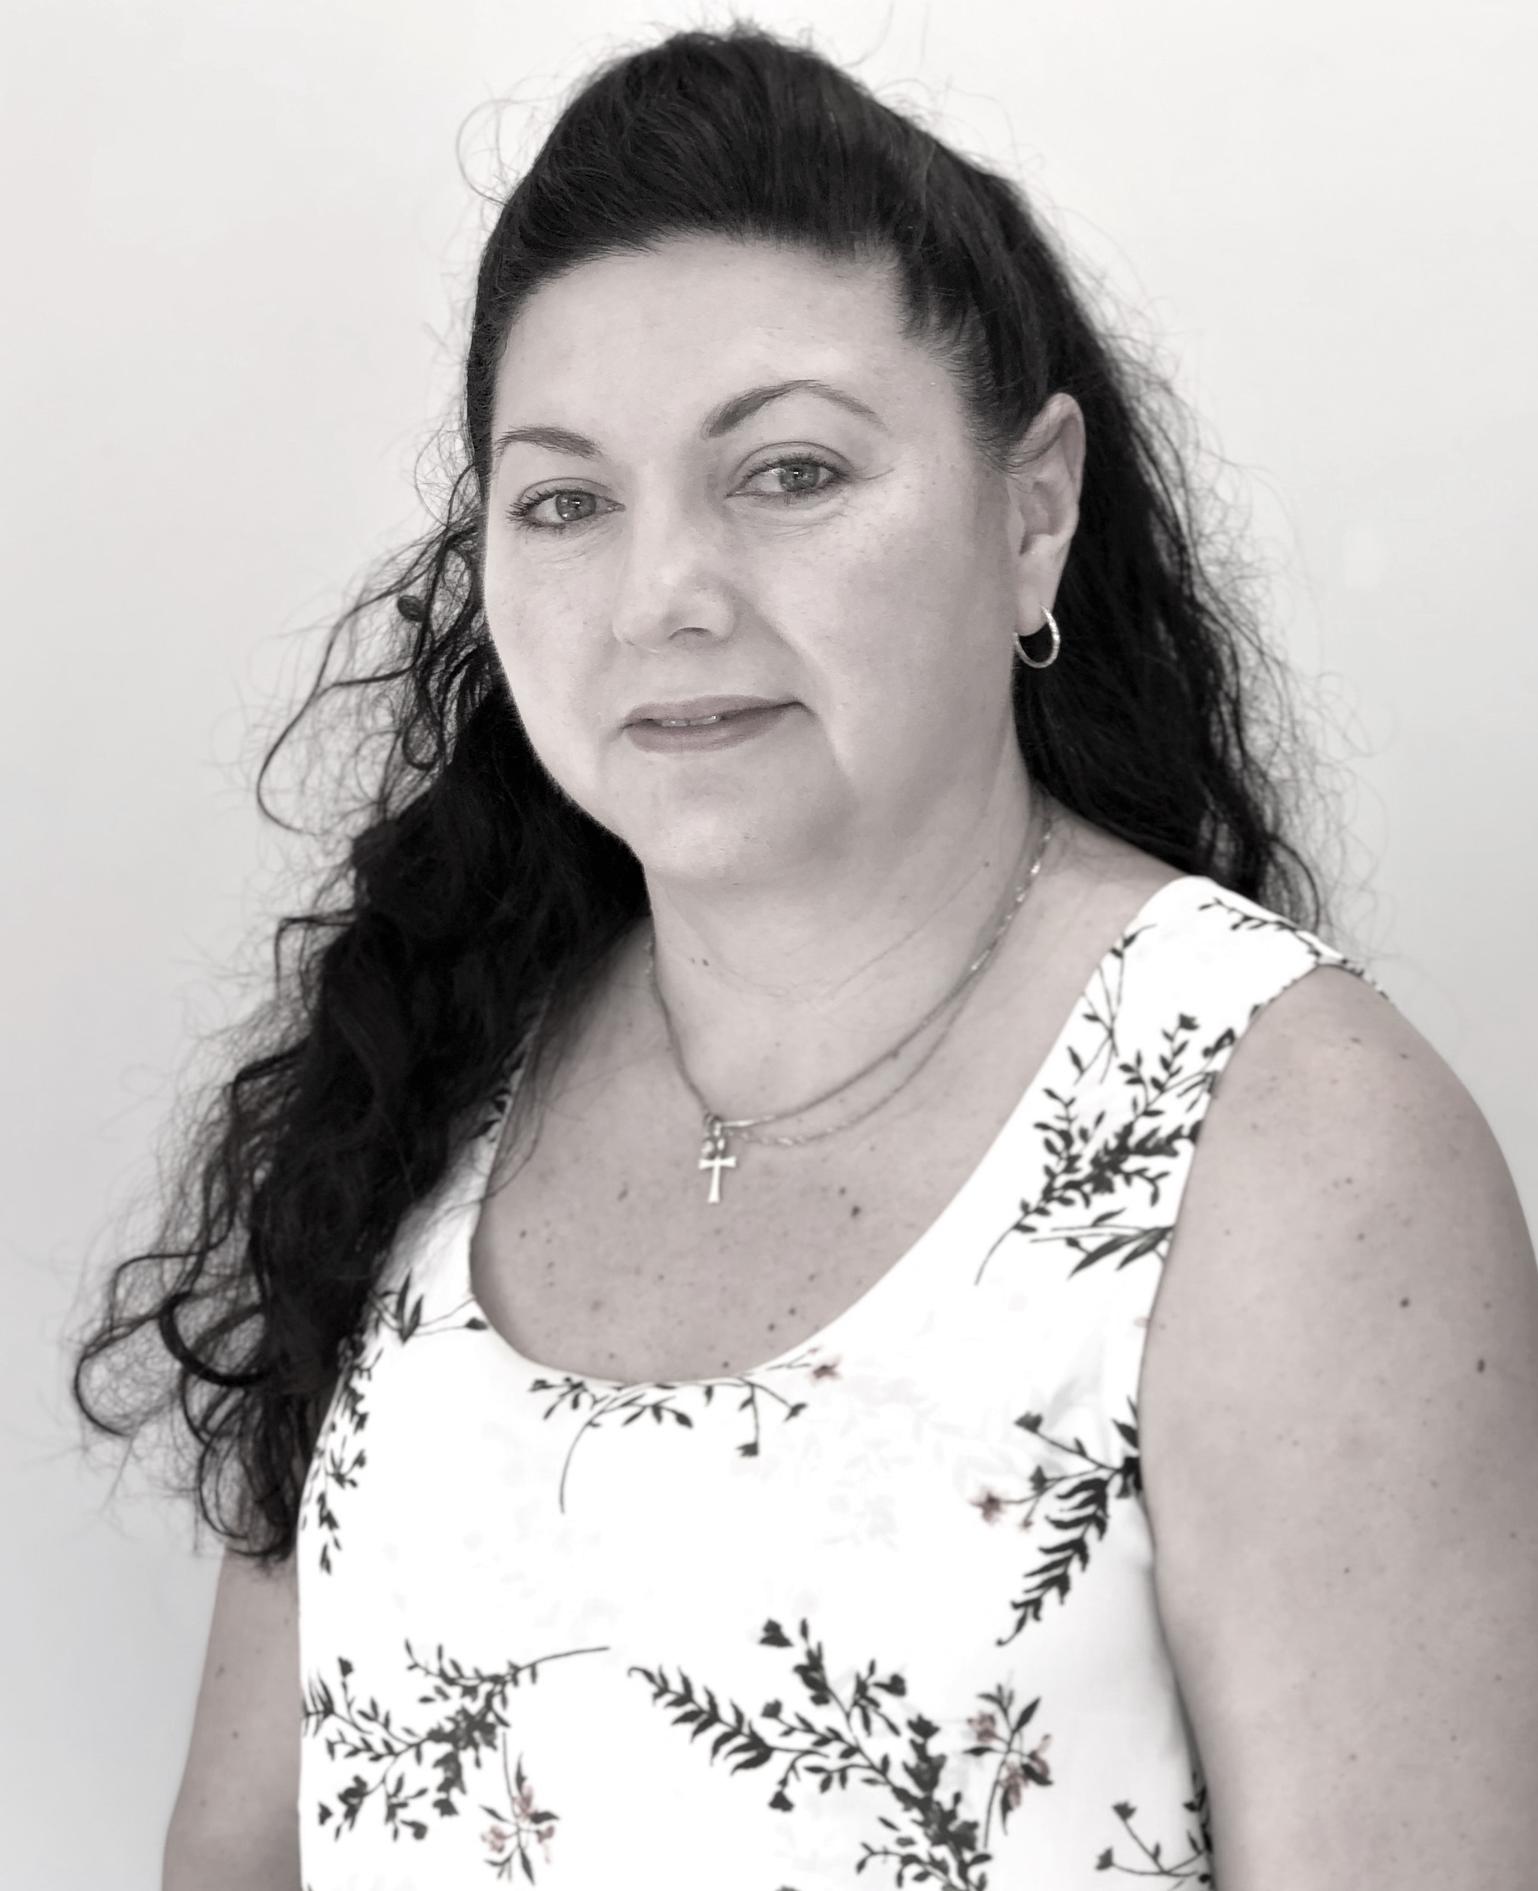 Véronica Ramirez